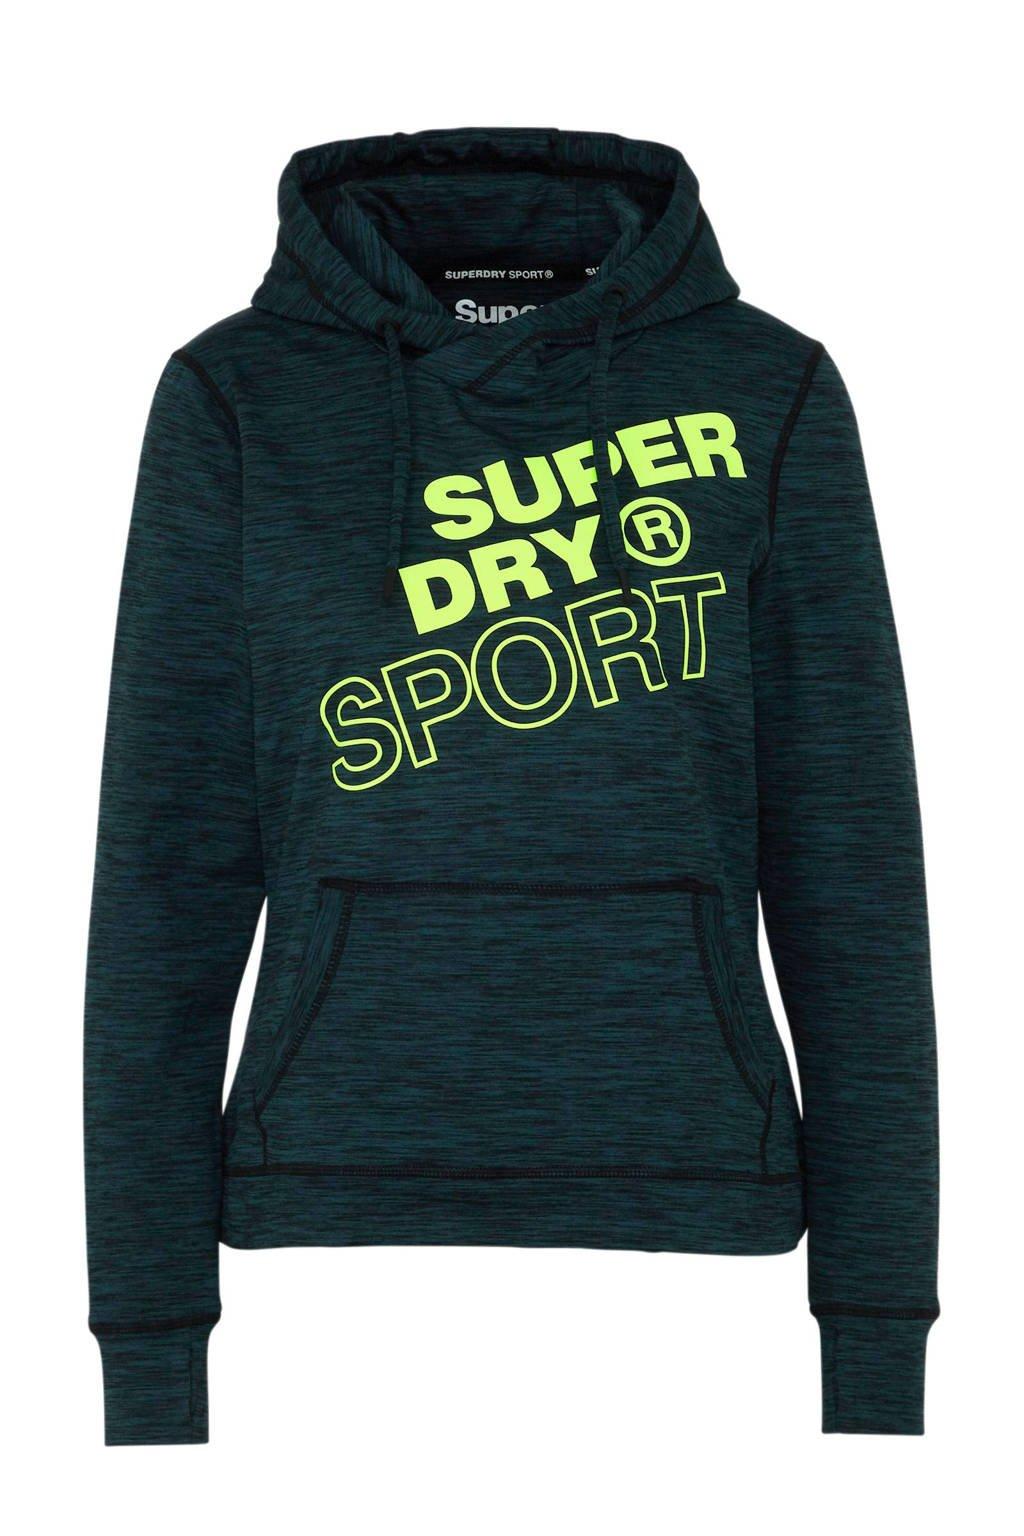 Superdry Sport sportsweater zwart, Donkergroen/zwart